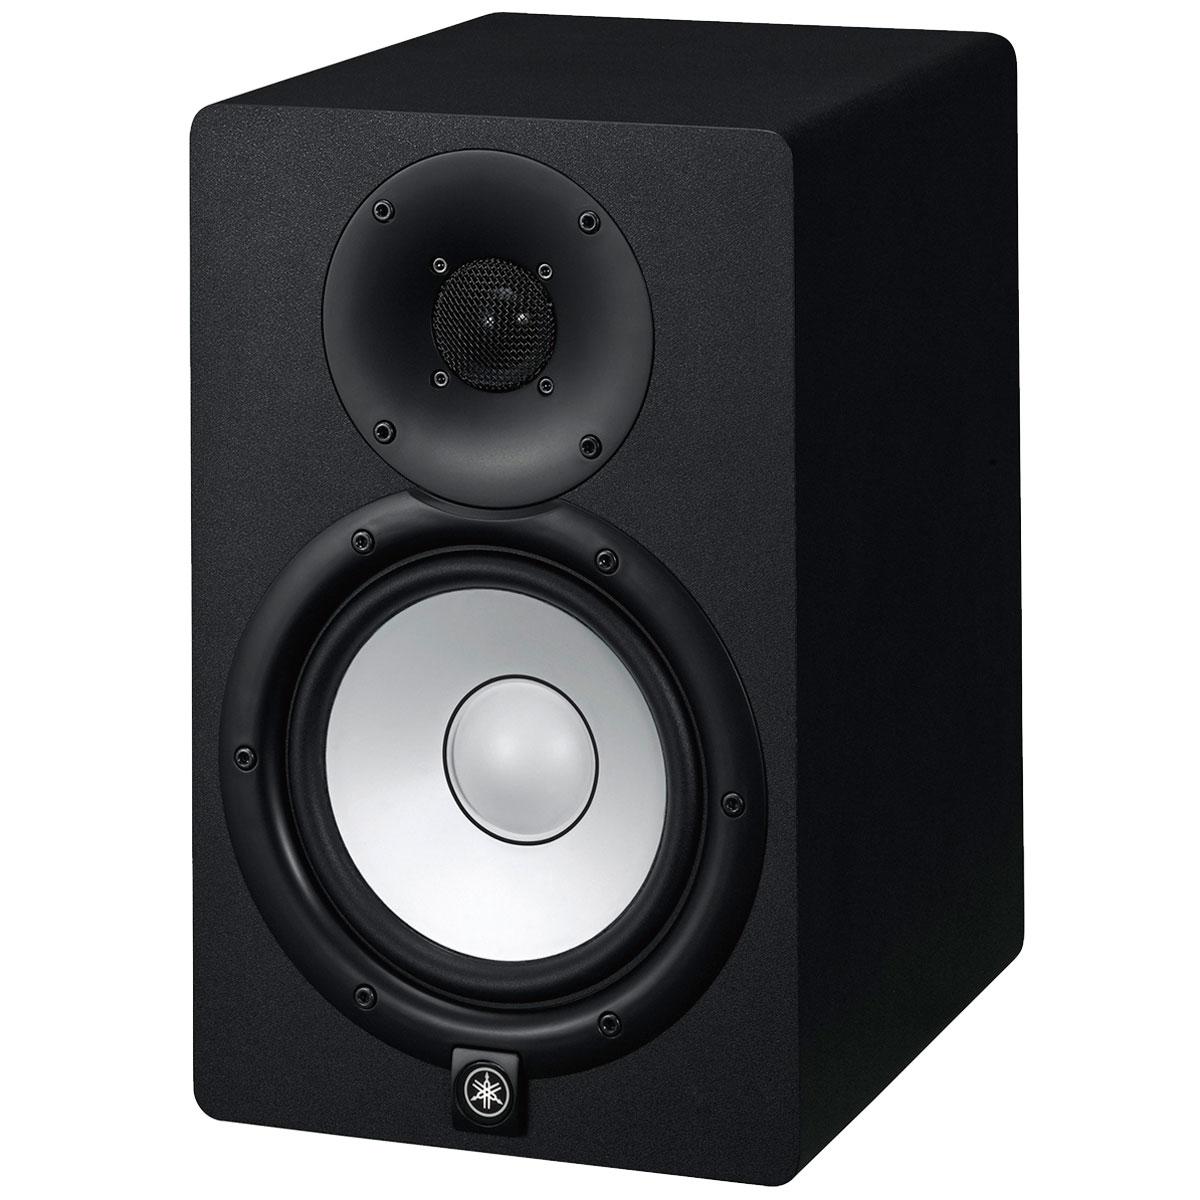 HS7 - Monitor de Referência 95W Preto HS 7 - Yamaha